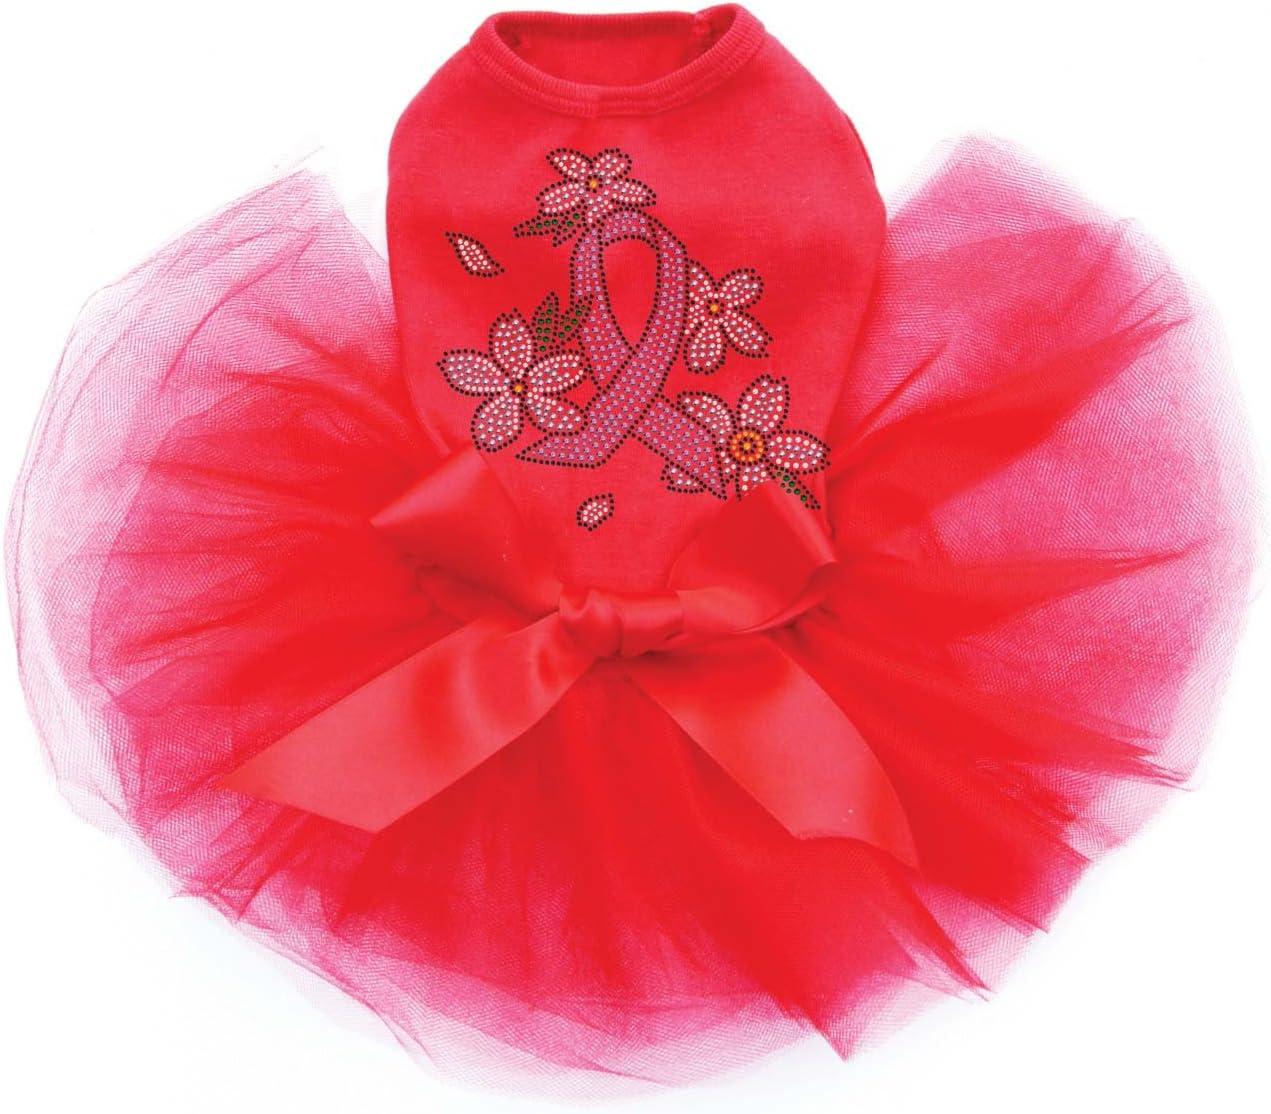 Pink Ribbon with Super intense SALE Flowers - Bling XS Tutu Max 78% OFF Dog Rhinestone R Dress